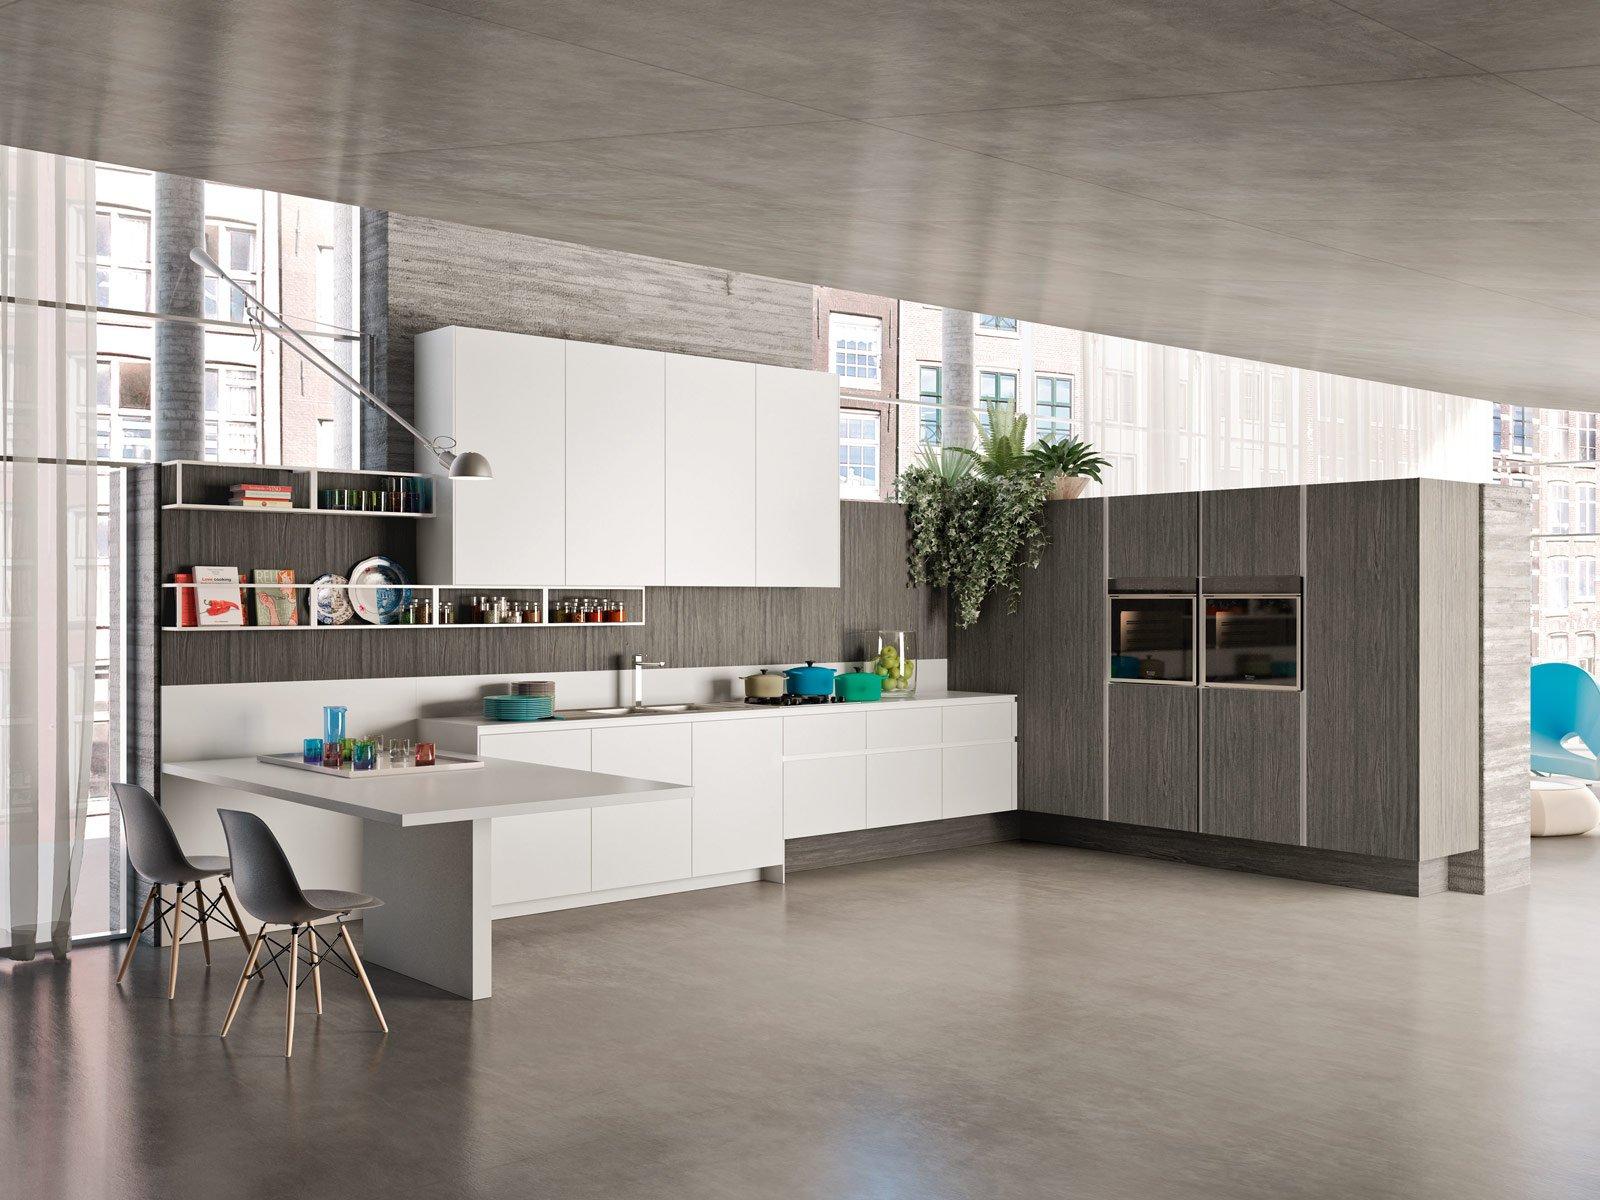 Cucine effetto legno per un ambiente caldo ed elegante - Parquet per cucine ...